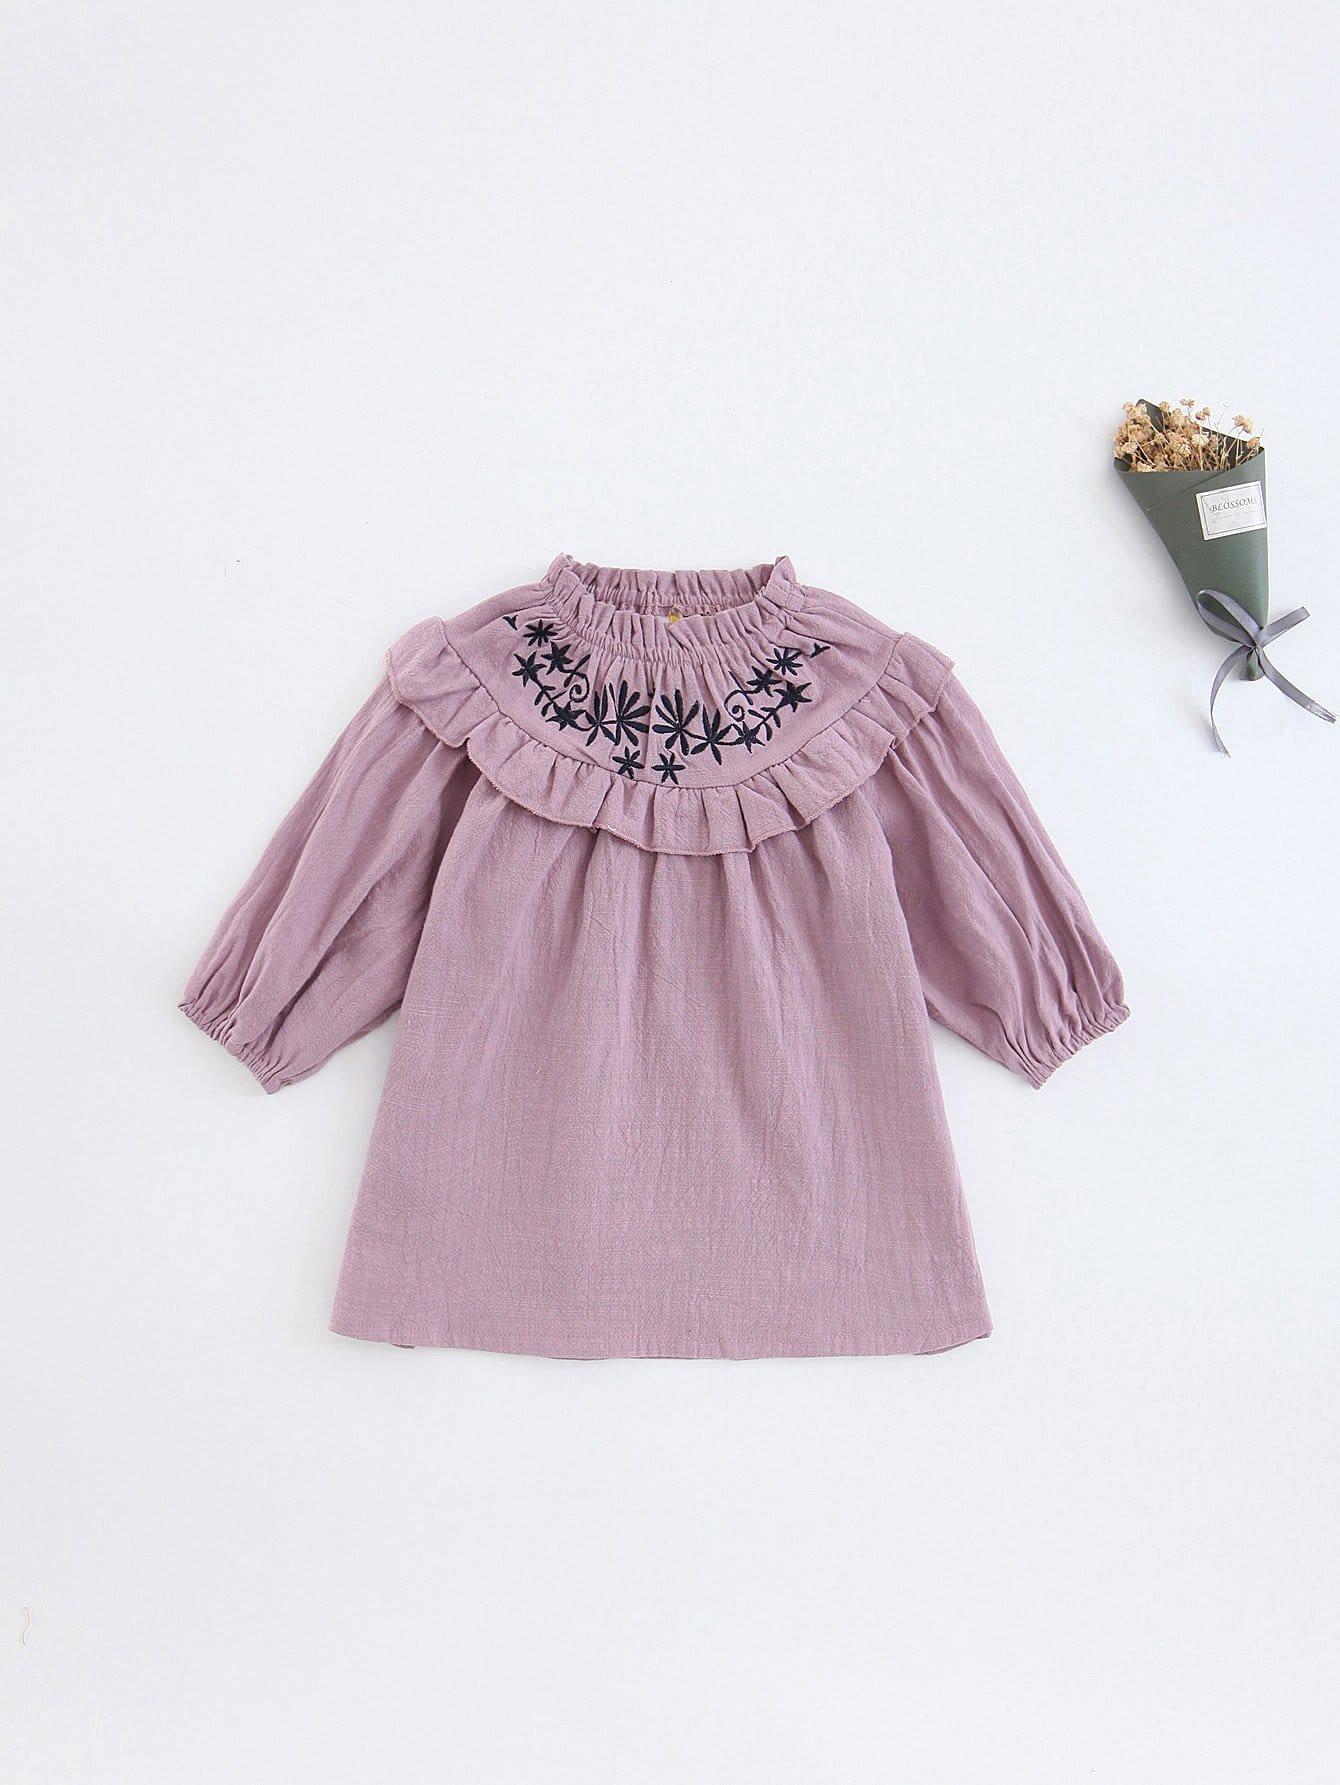 Girls Embroidery Detail Frill Trim Dress girls embroidery detail frill trim blouse